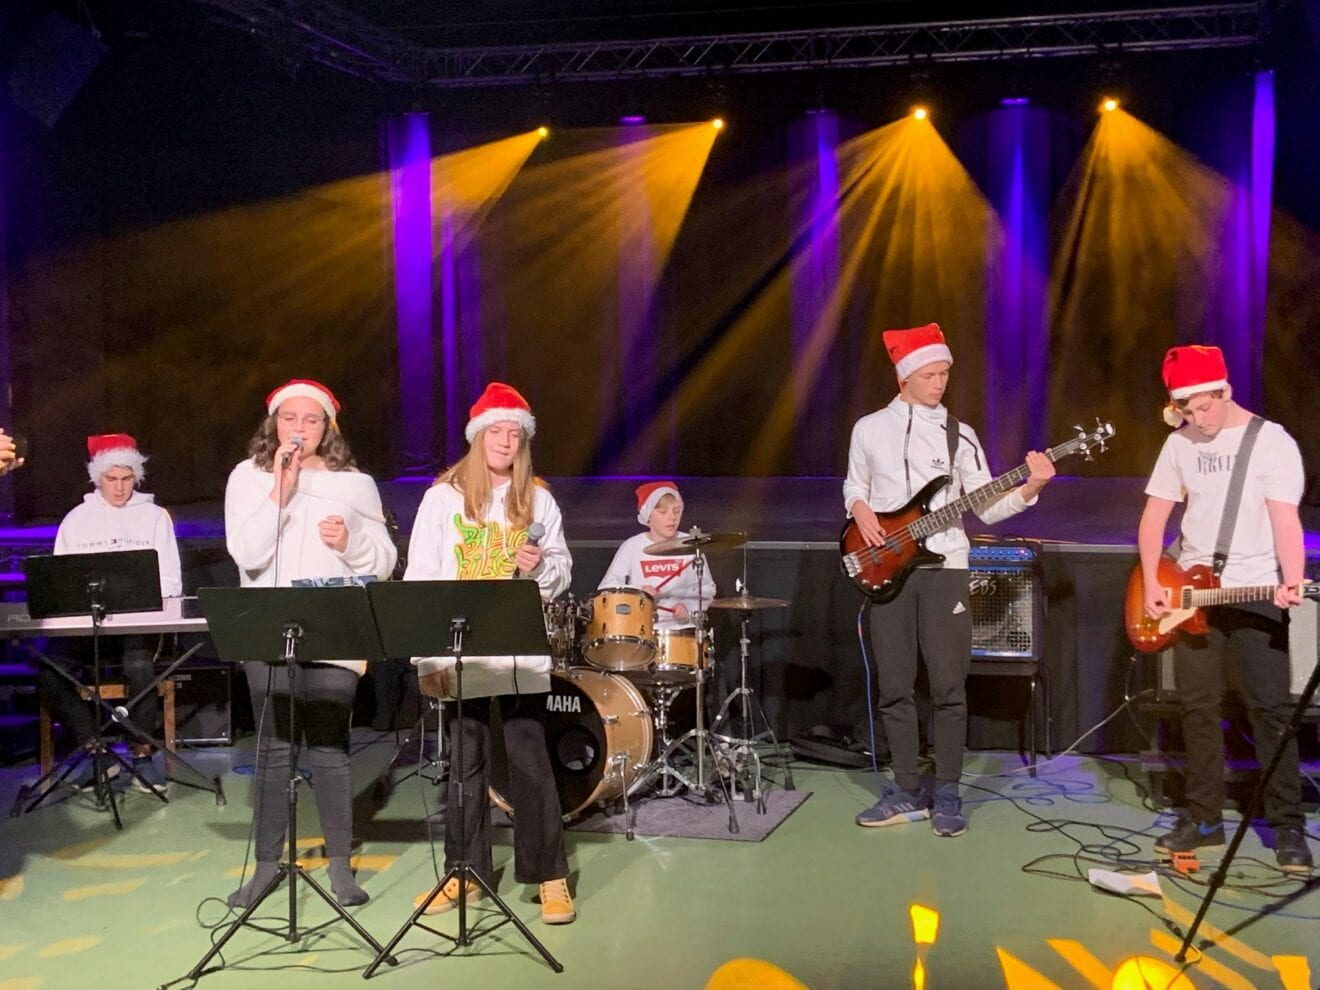 Ringsted Musik & Kulturskoles Julekalender 2020